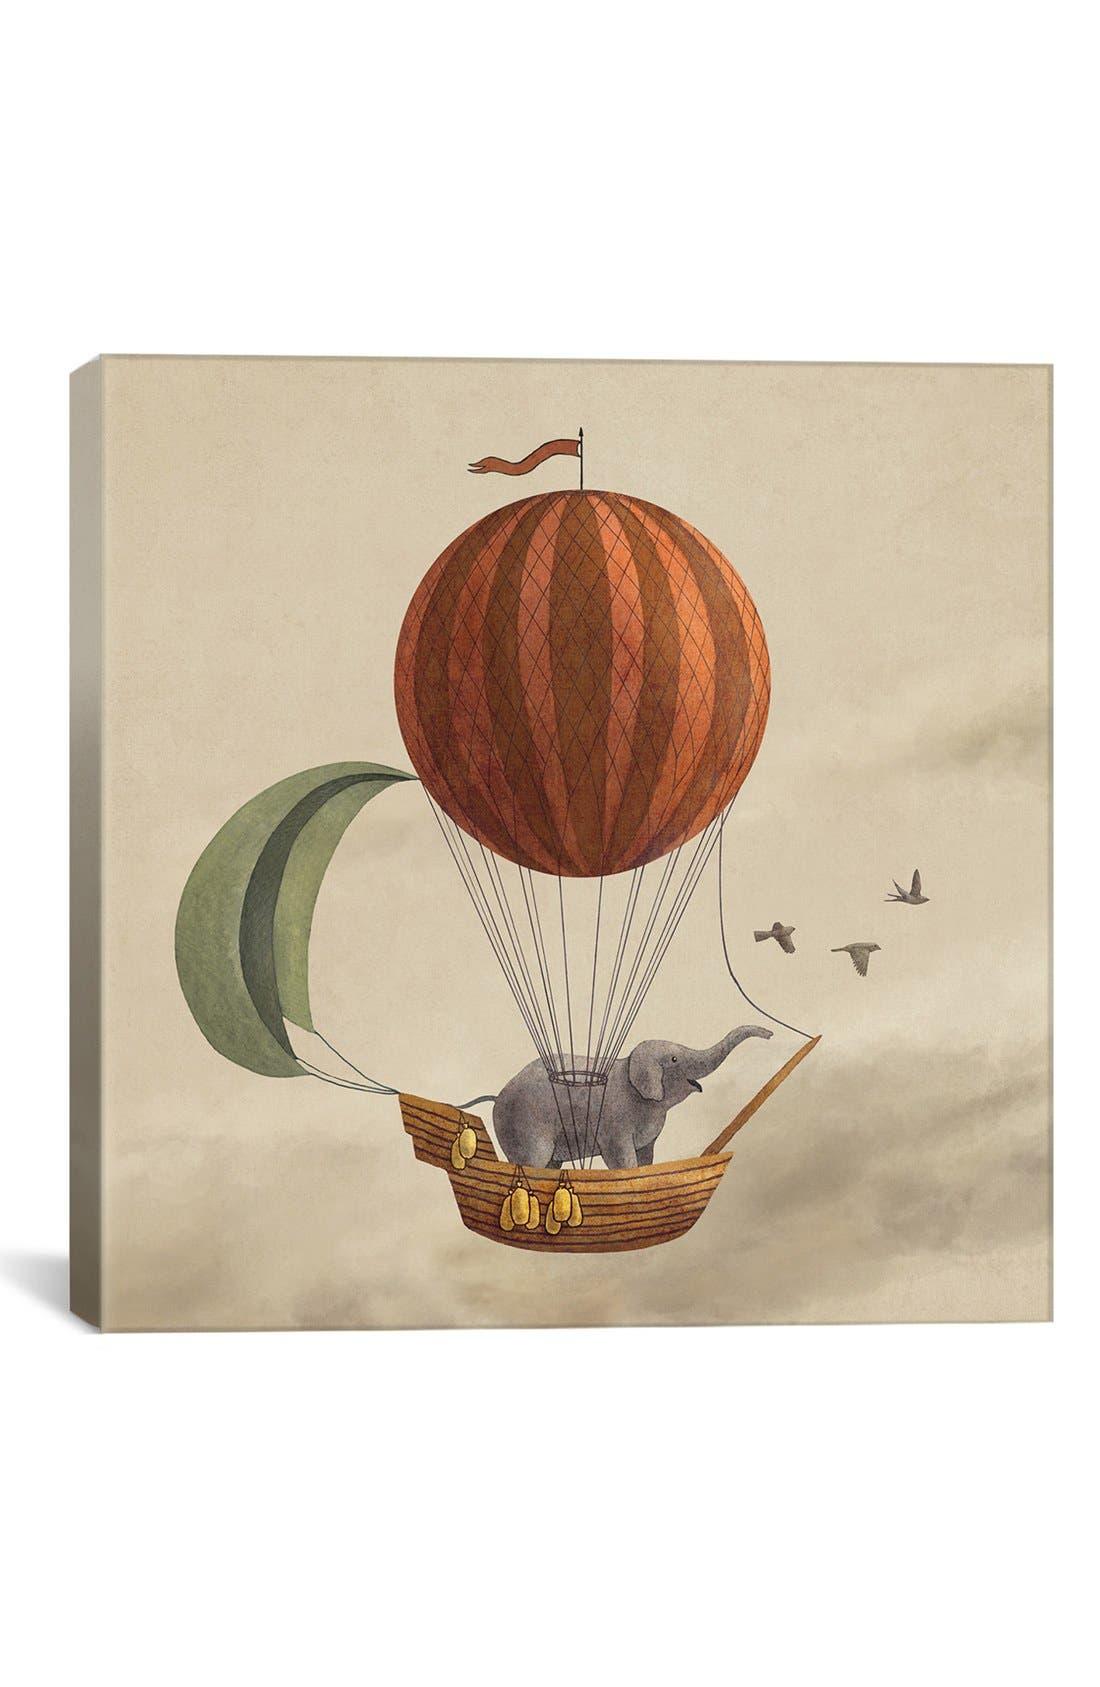 'Adventure Awaits - Terry Fan' Giclée Print Canvas Art,                             Main thumbnail 1, color,                             250